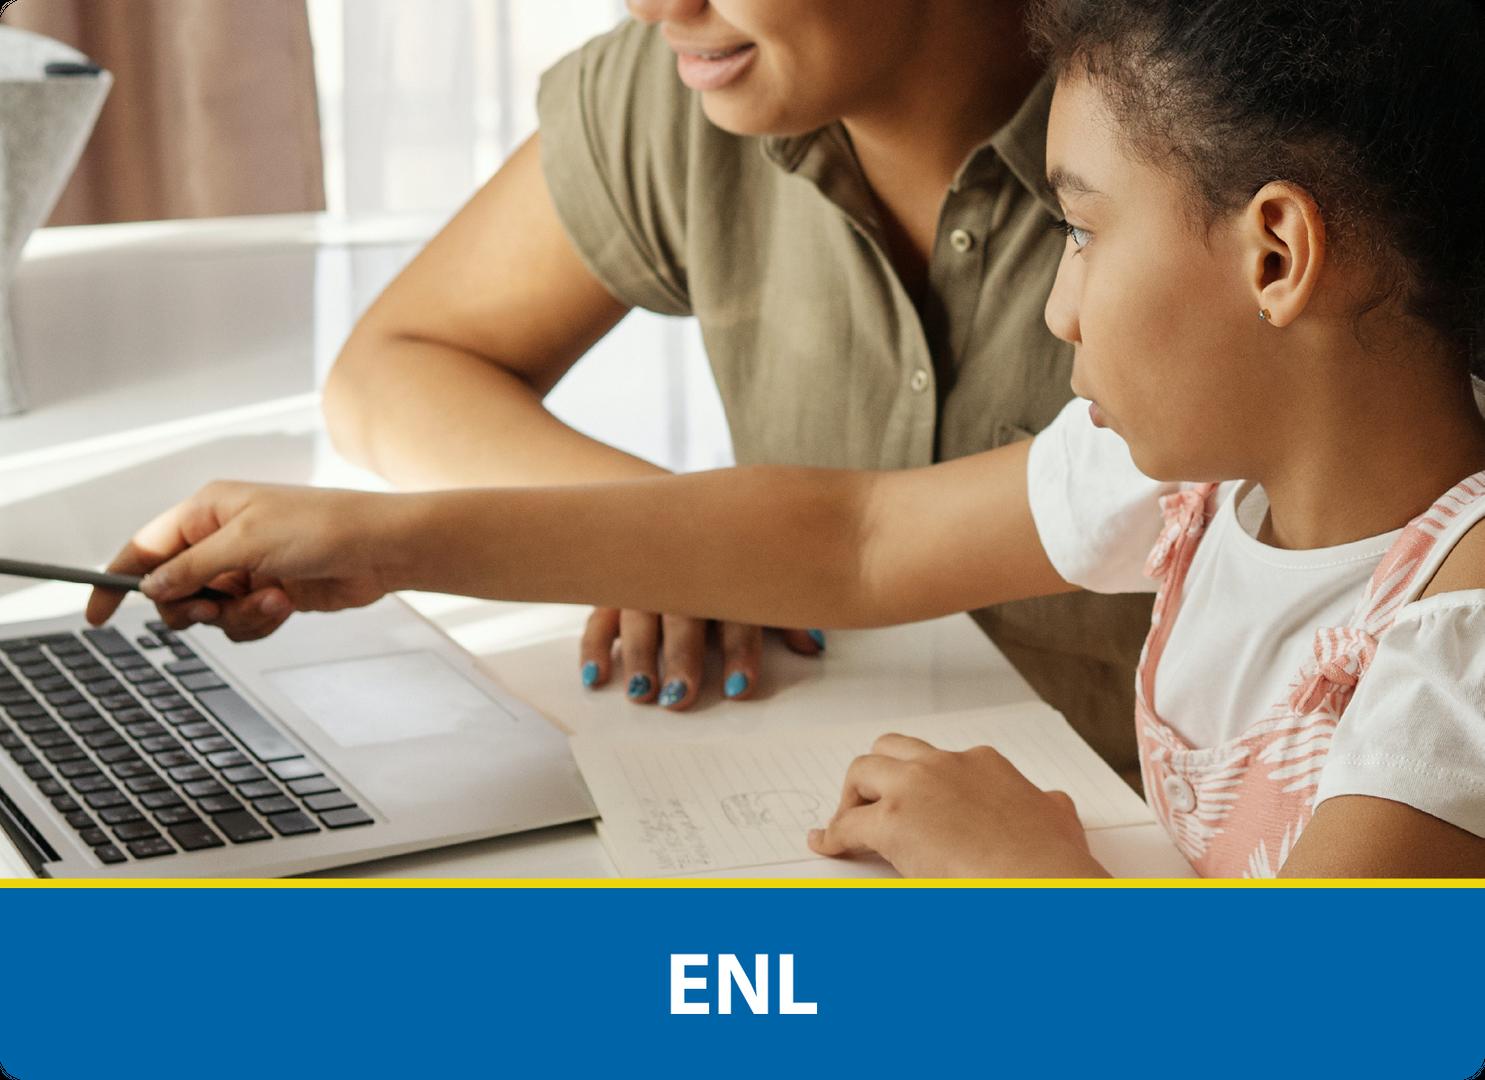 ENL: Student gestures to laptop beside teacher